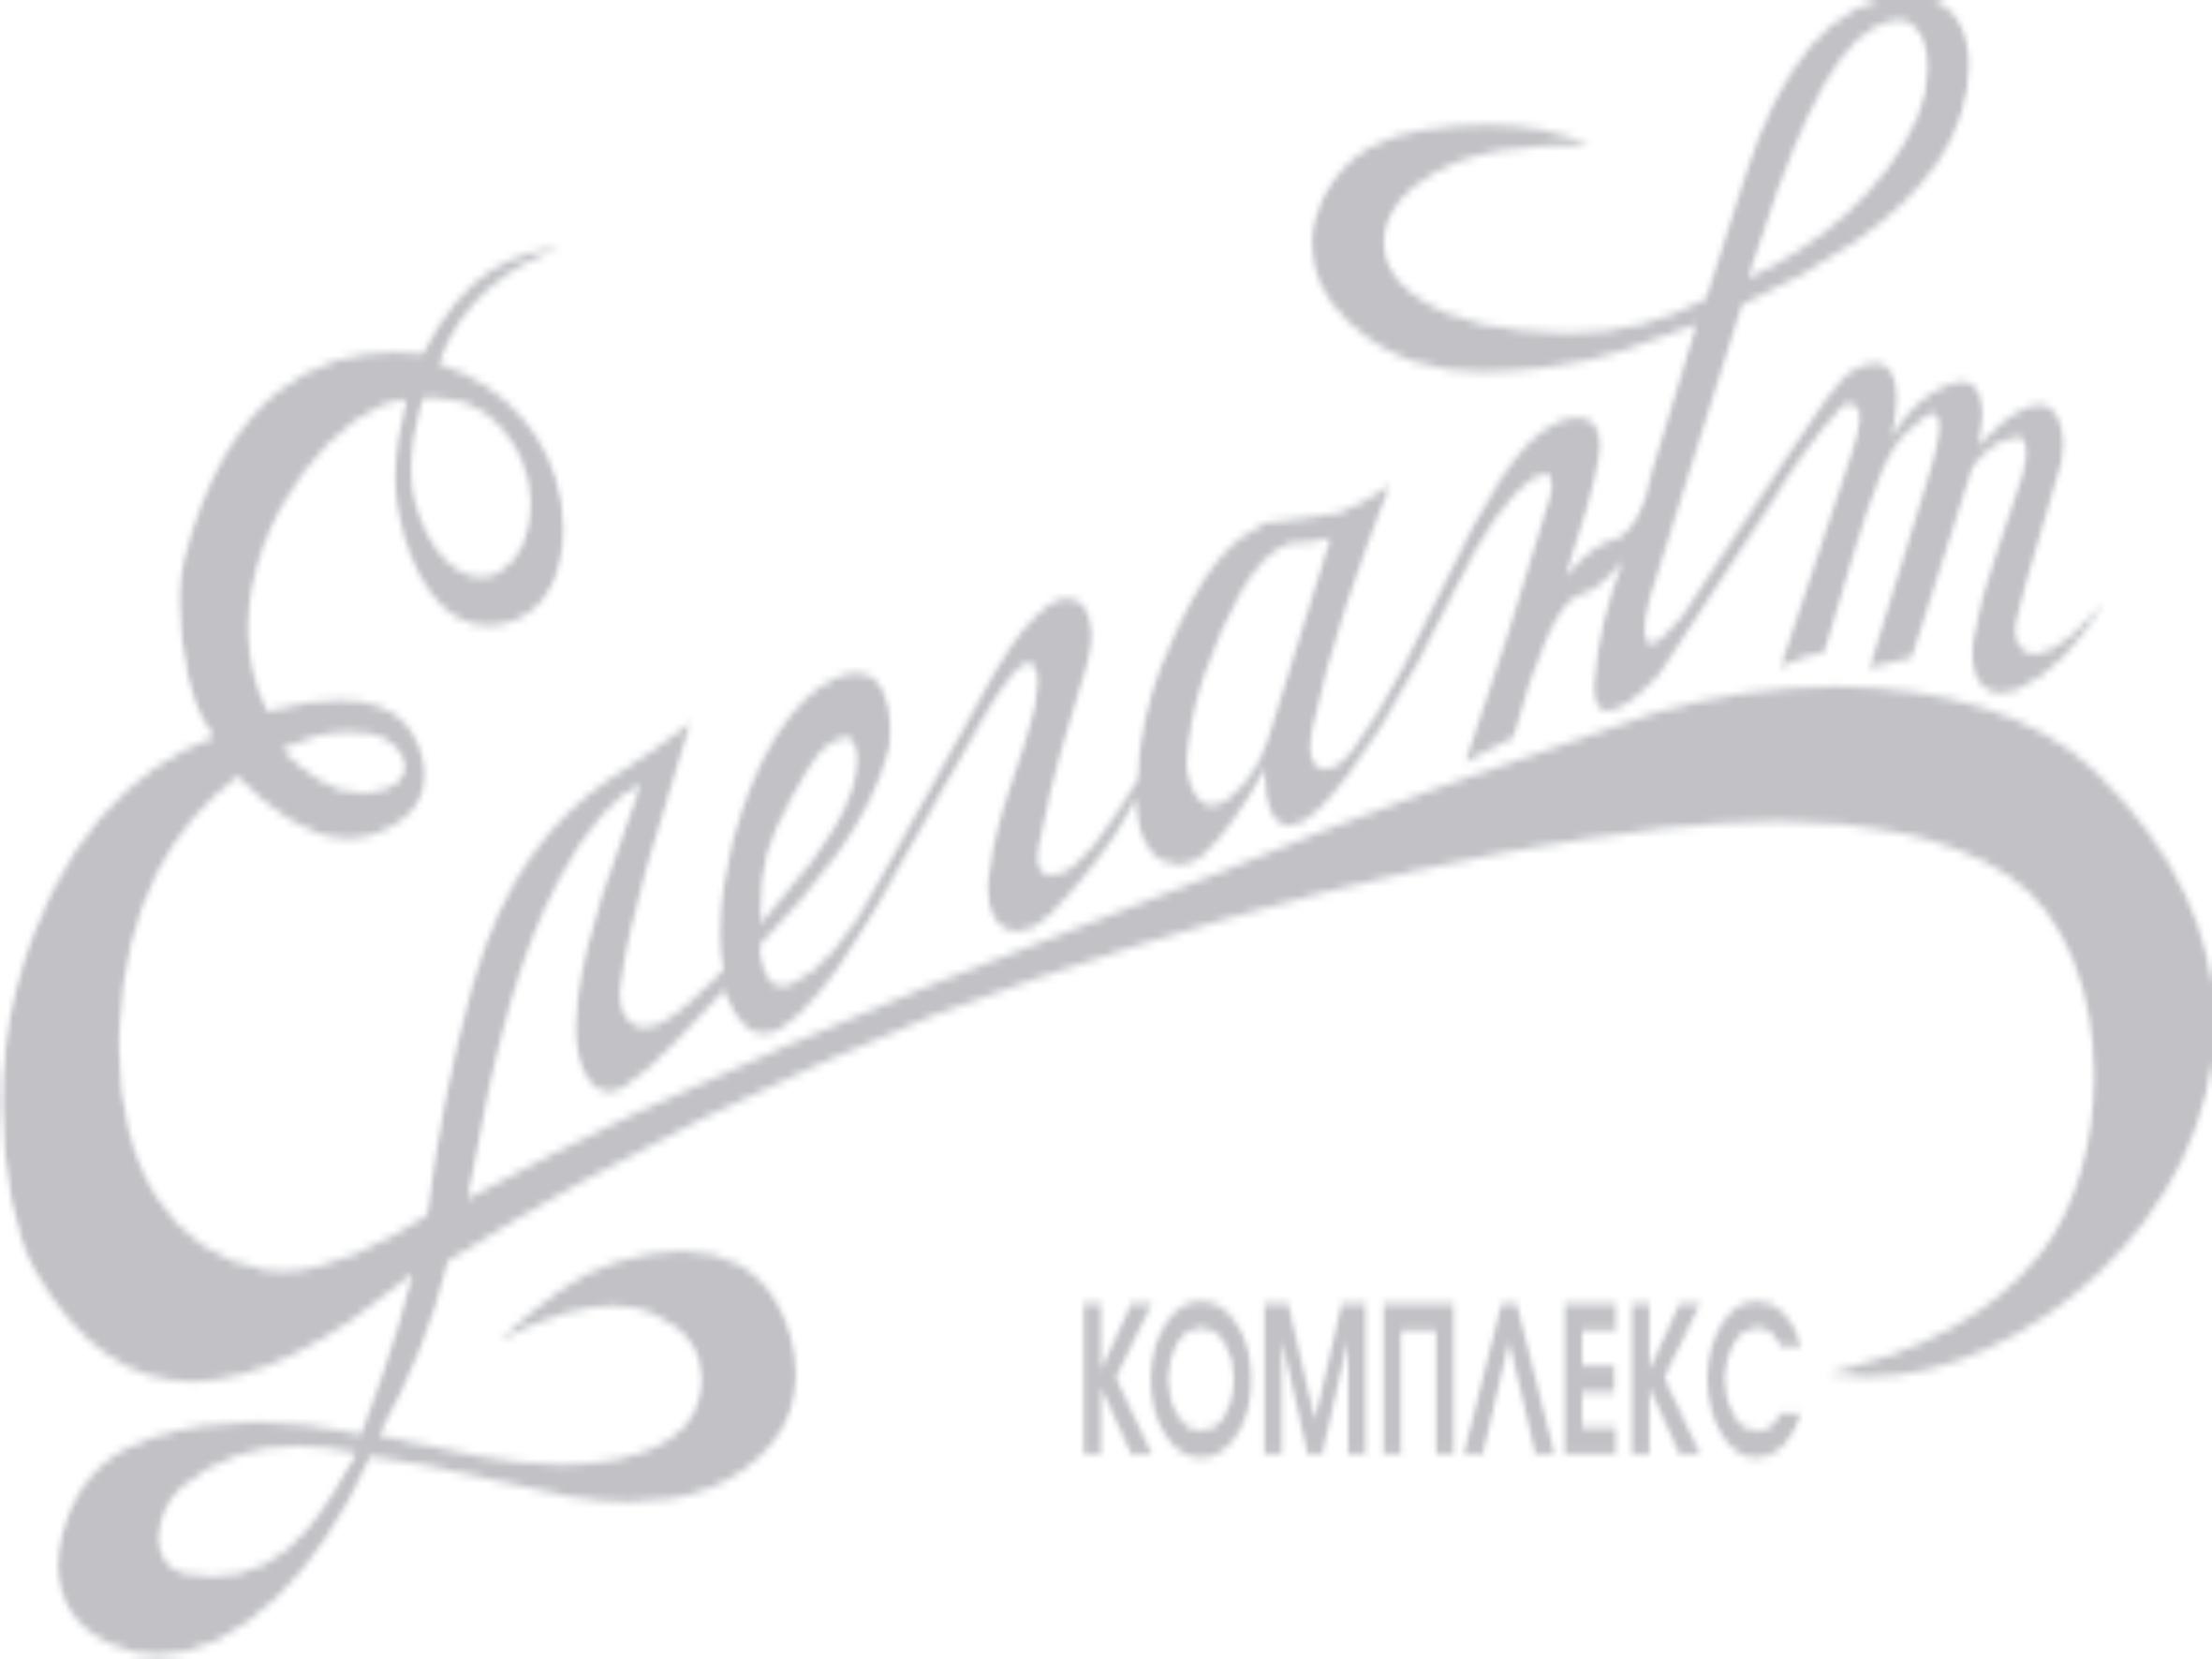 elegant_logo.jpg